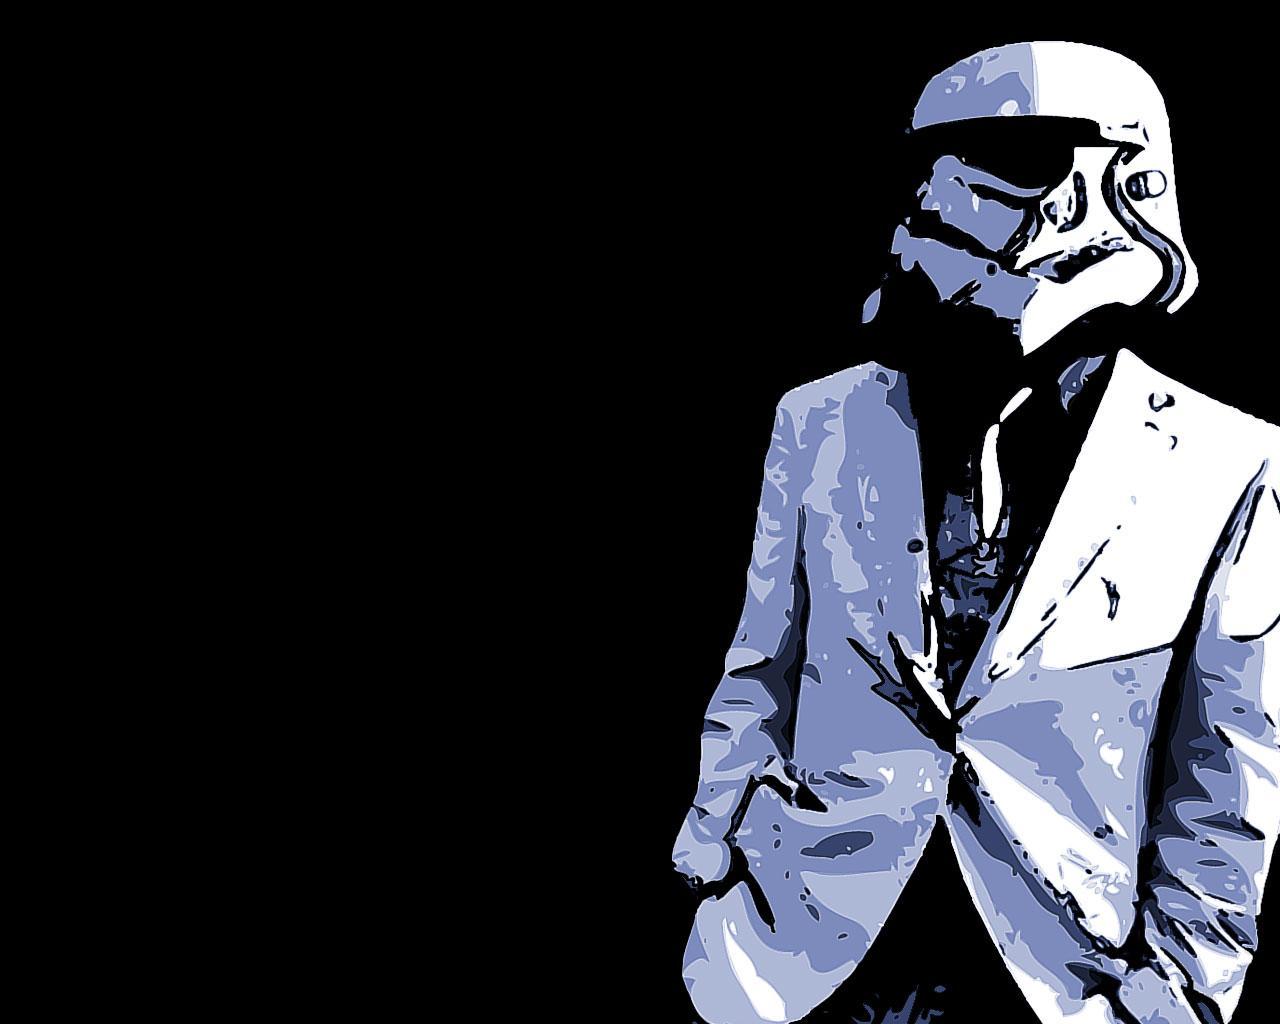 Wallpaper Background Wallpaper Star Wars Images Singebloggg